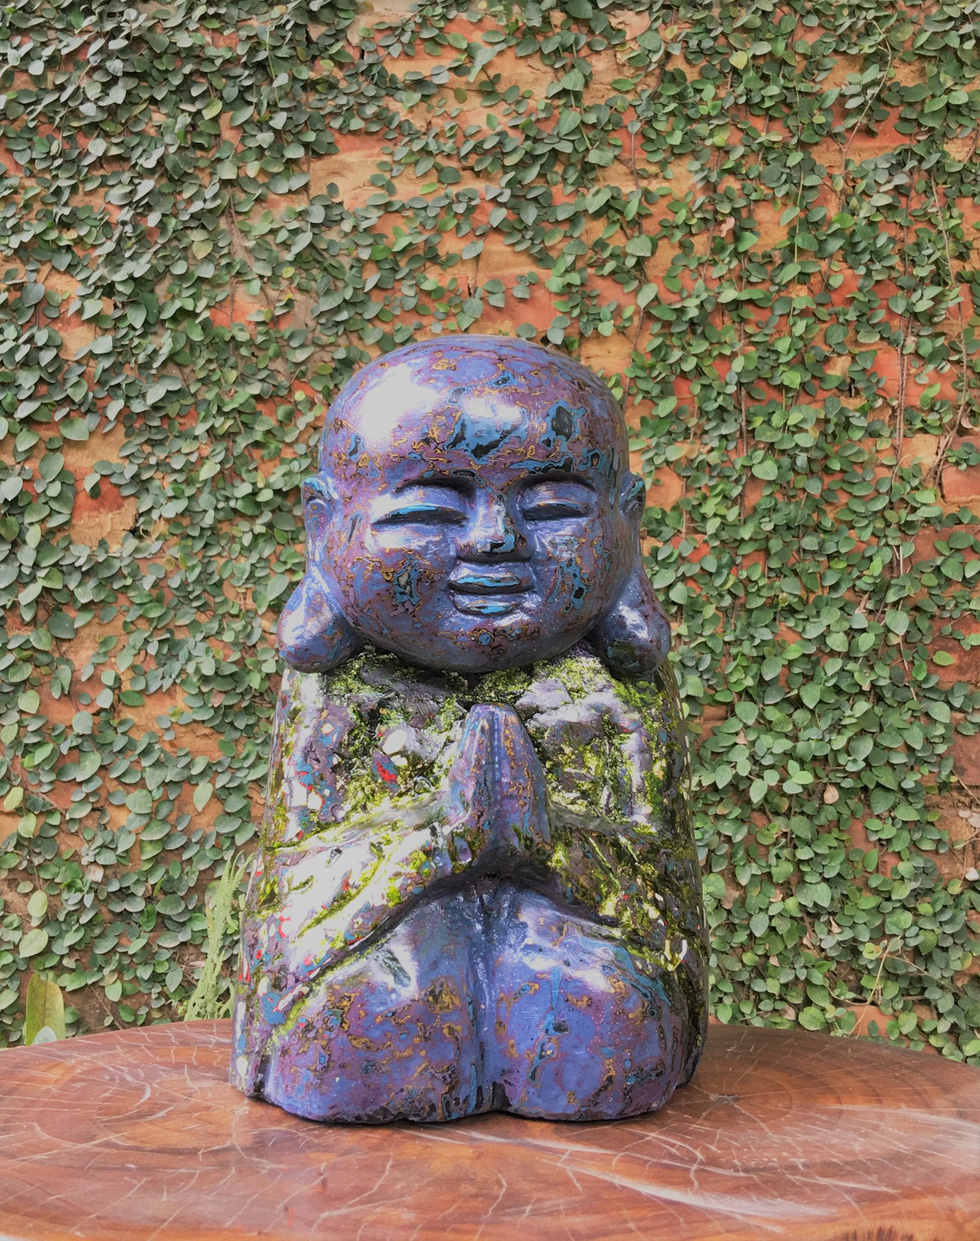 Sculpture works at an online exhibition